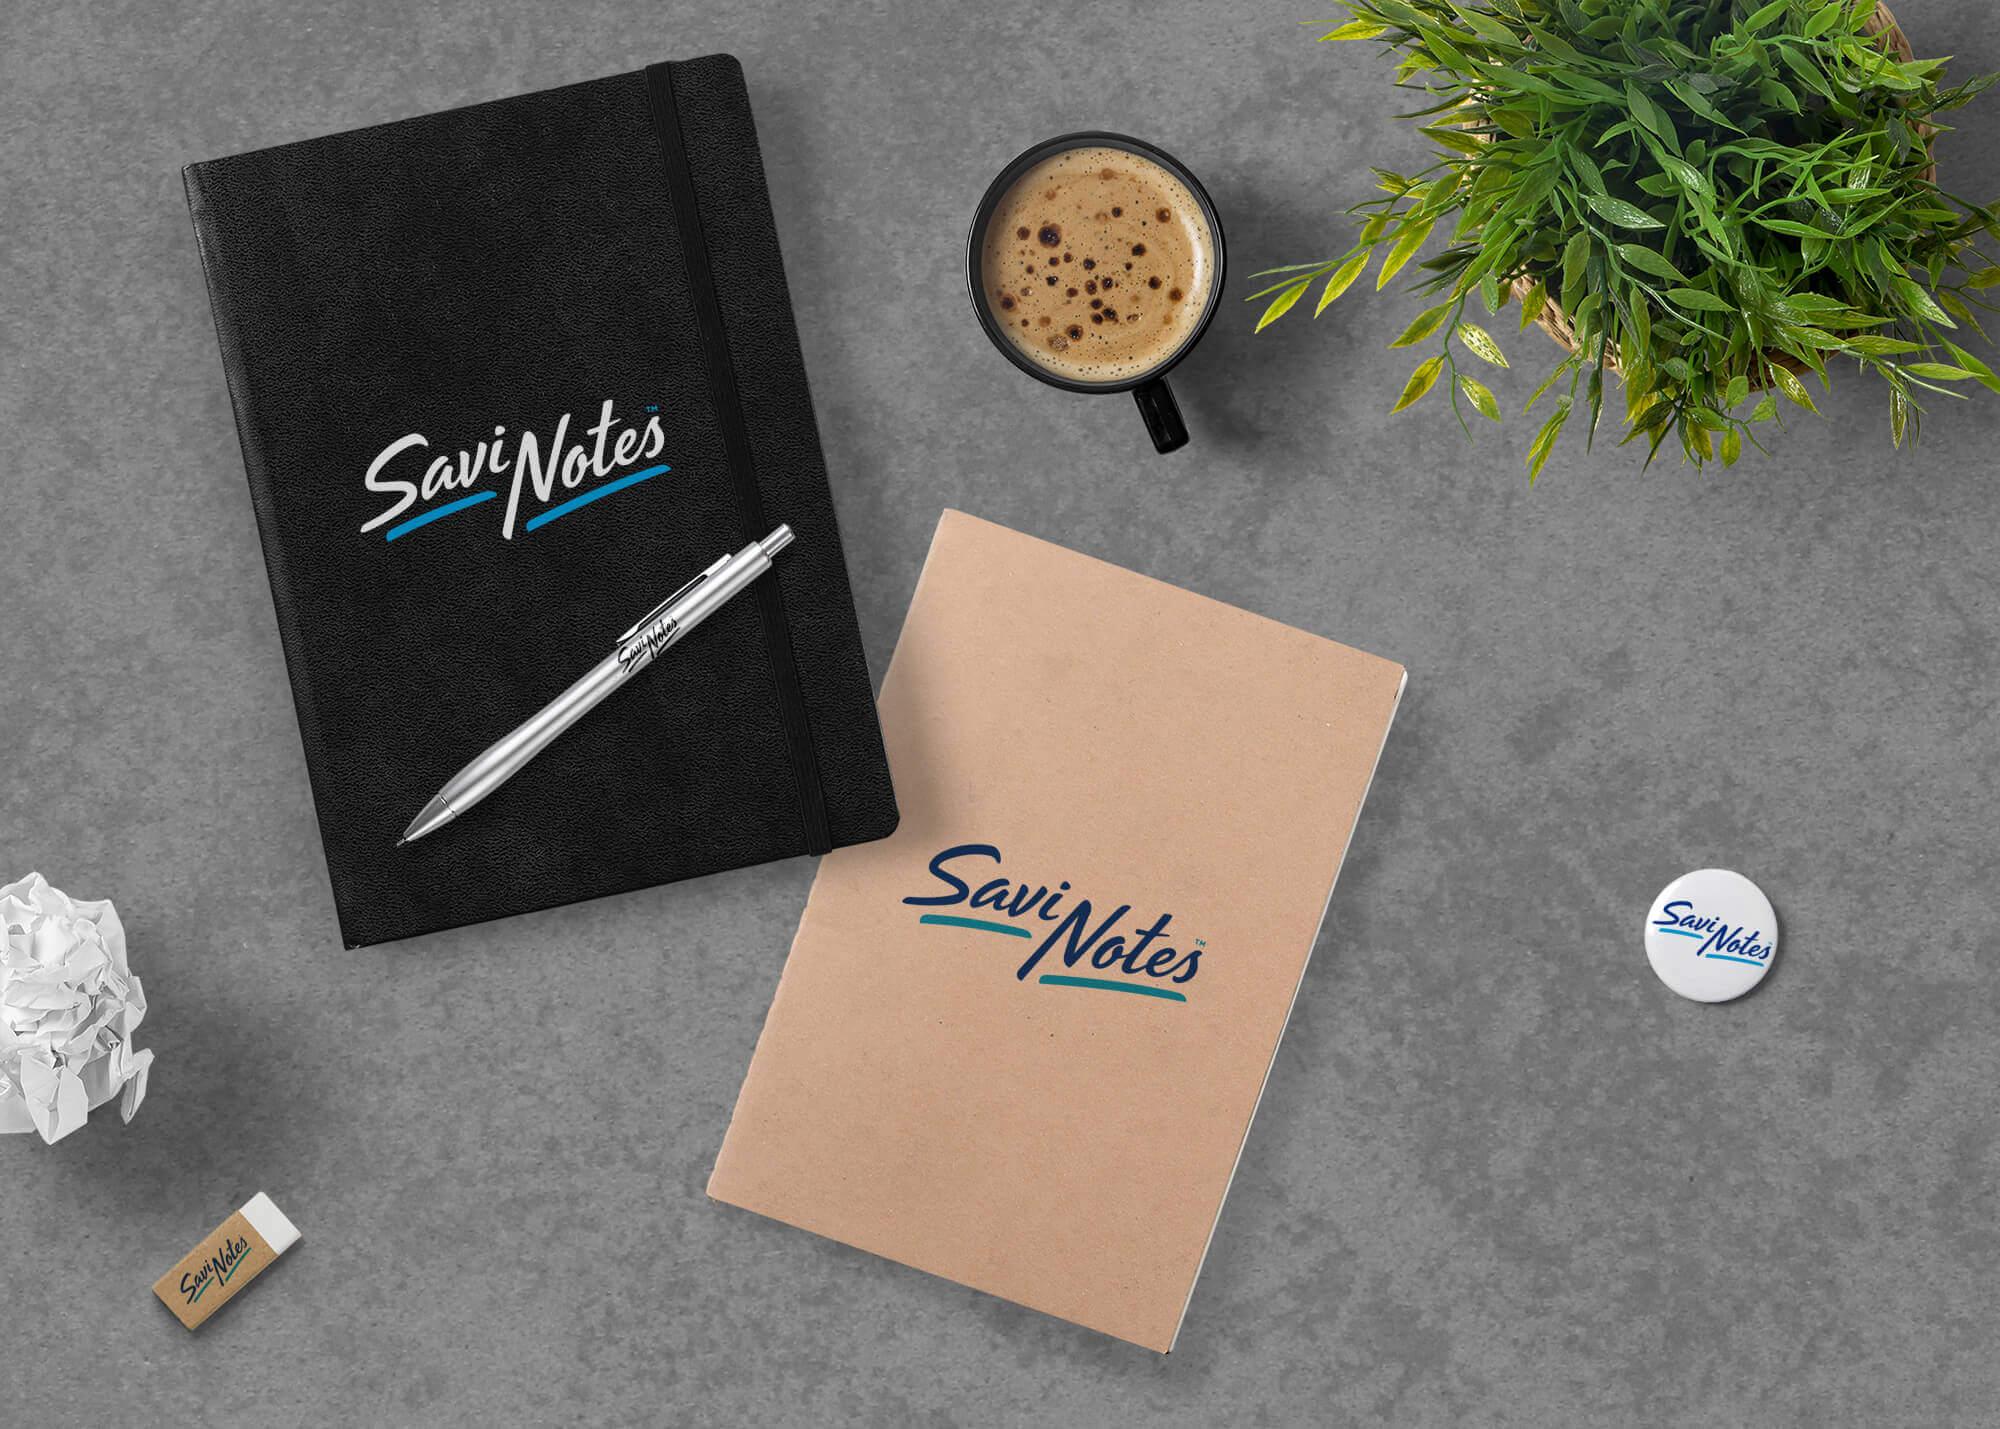 Savinotes Notebooks Mockup